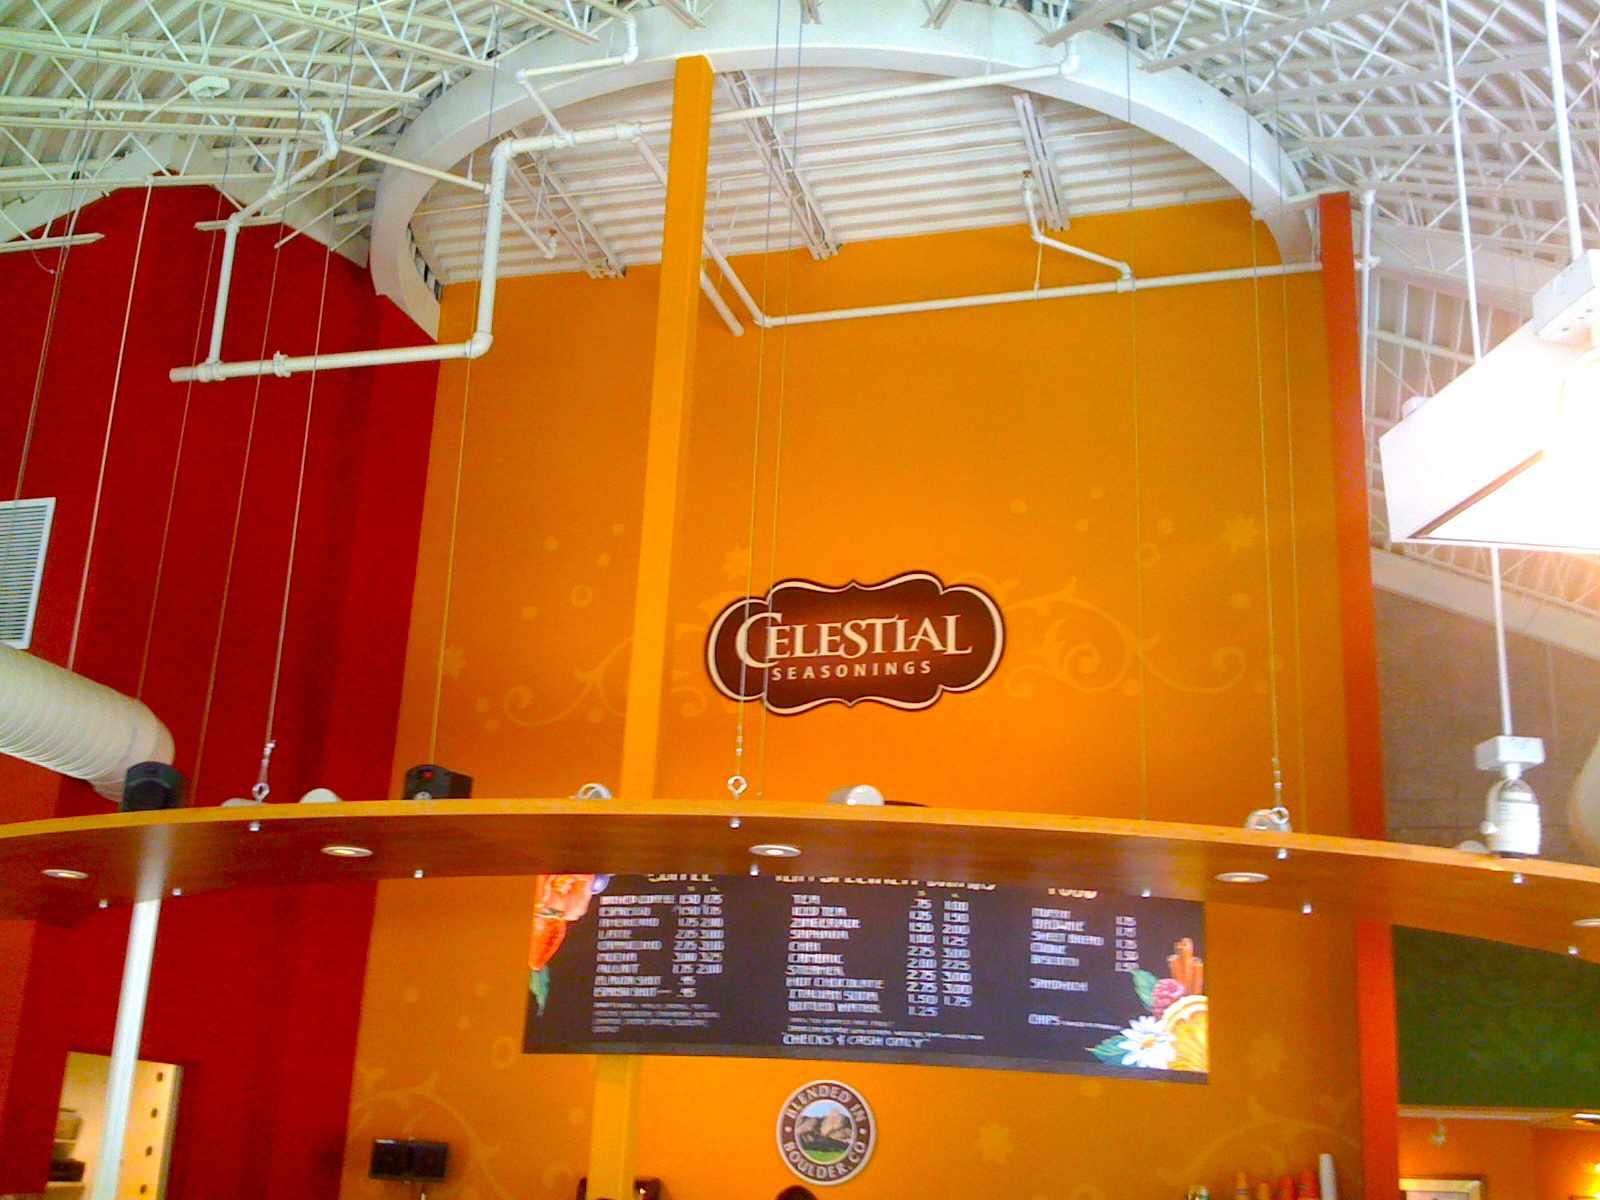 Celestial Seasonings Factory Tour